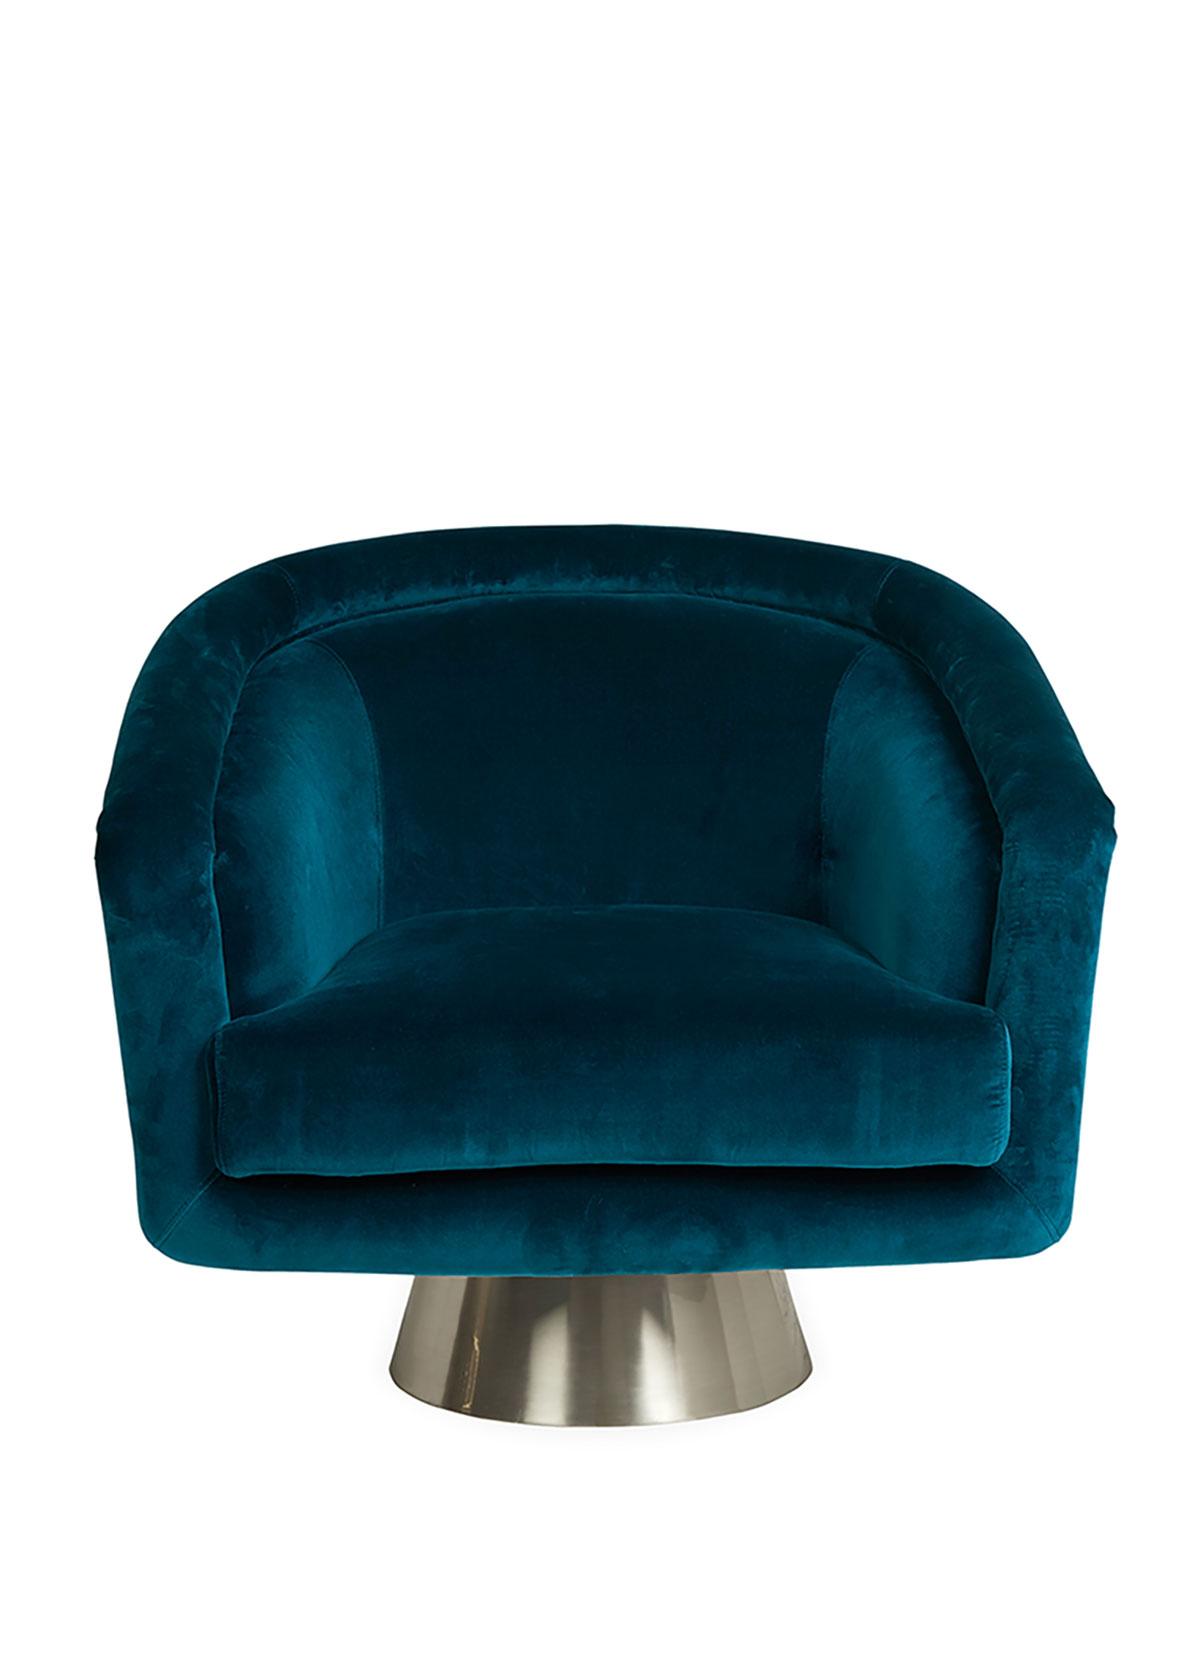 Jonathan Adler Furnitures BACHARACH SWIVEL CHAIR